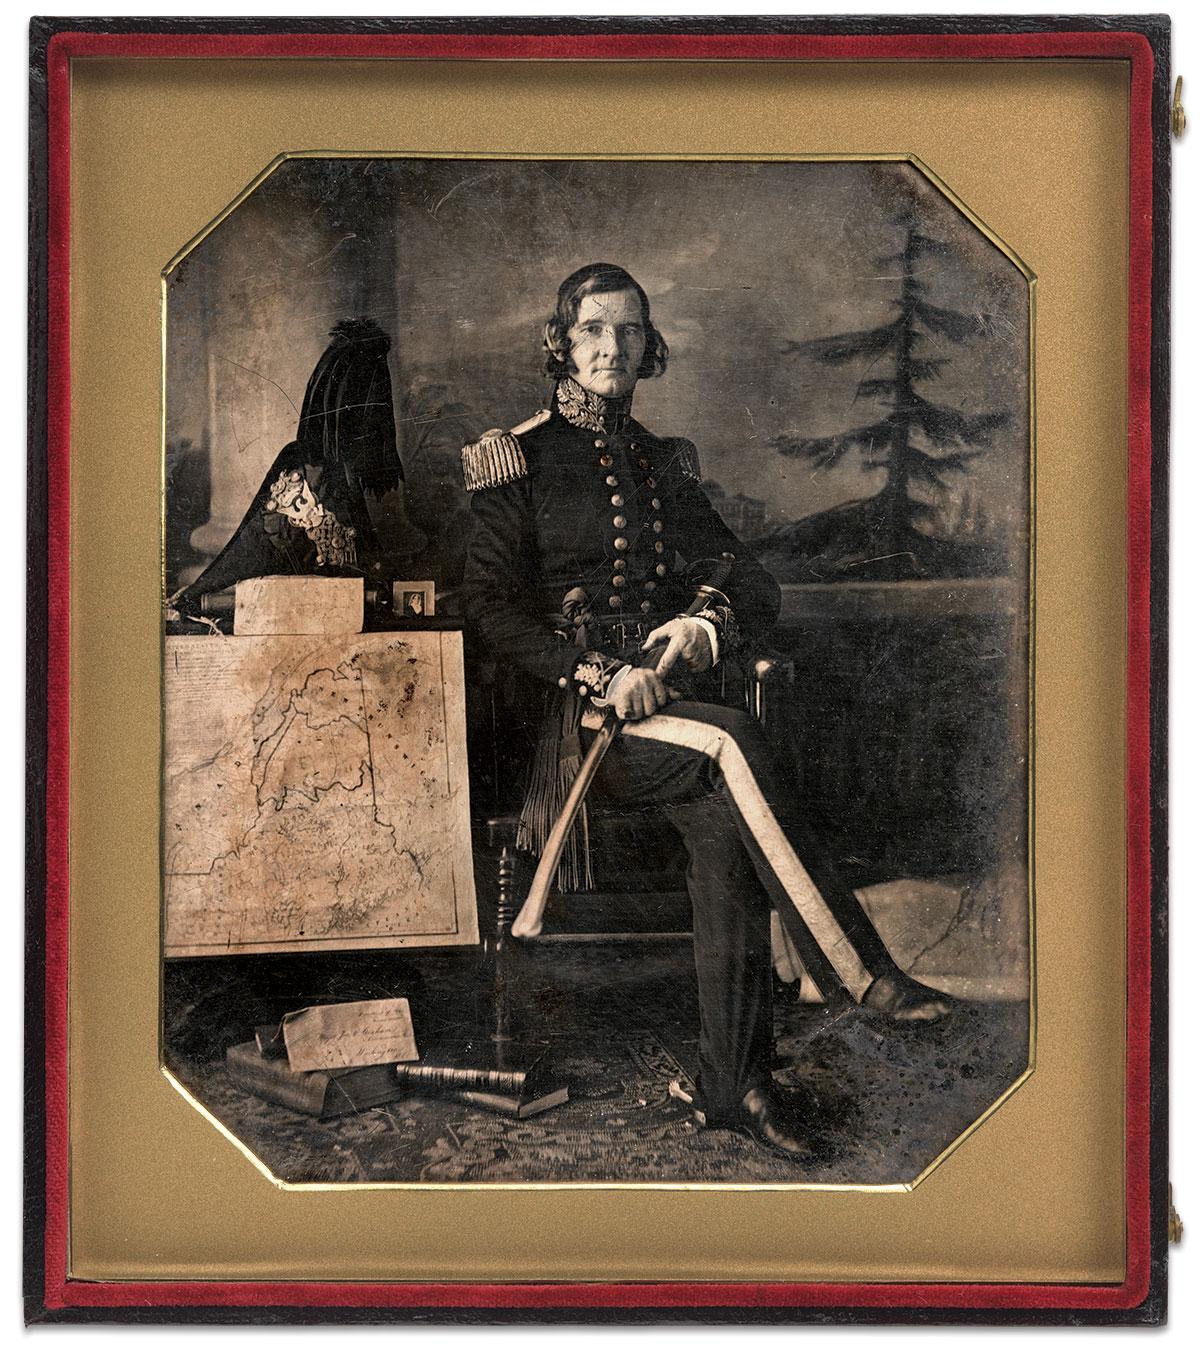 Half-plate daguerreotype by John Plumbe Jr. of Washington, D.C. National Portrait Gallery Collection.